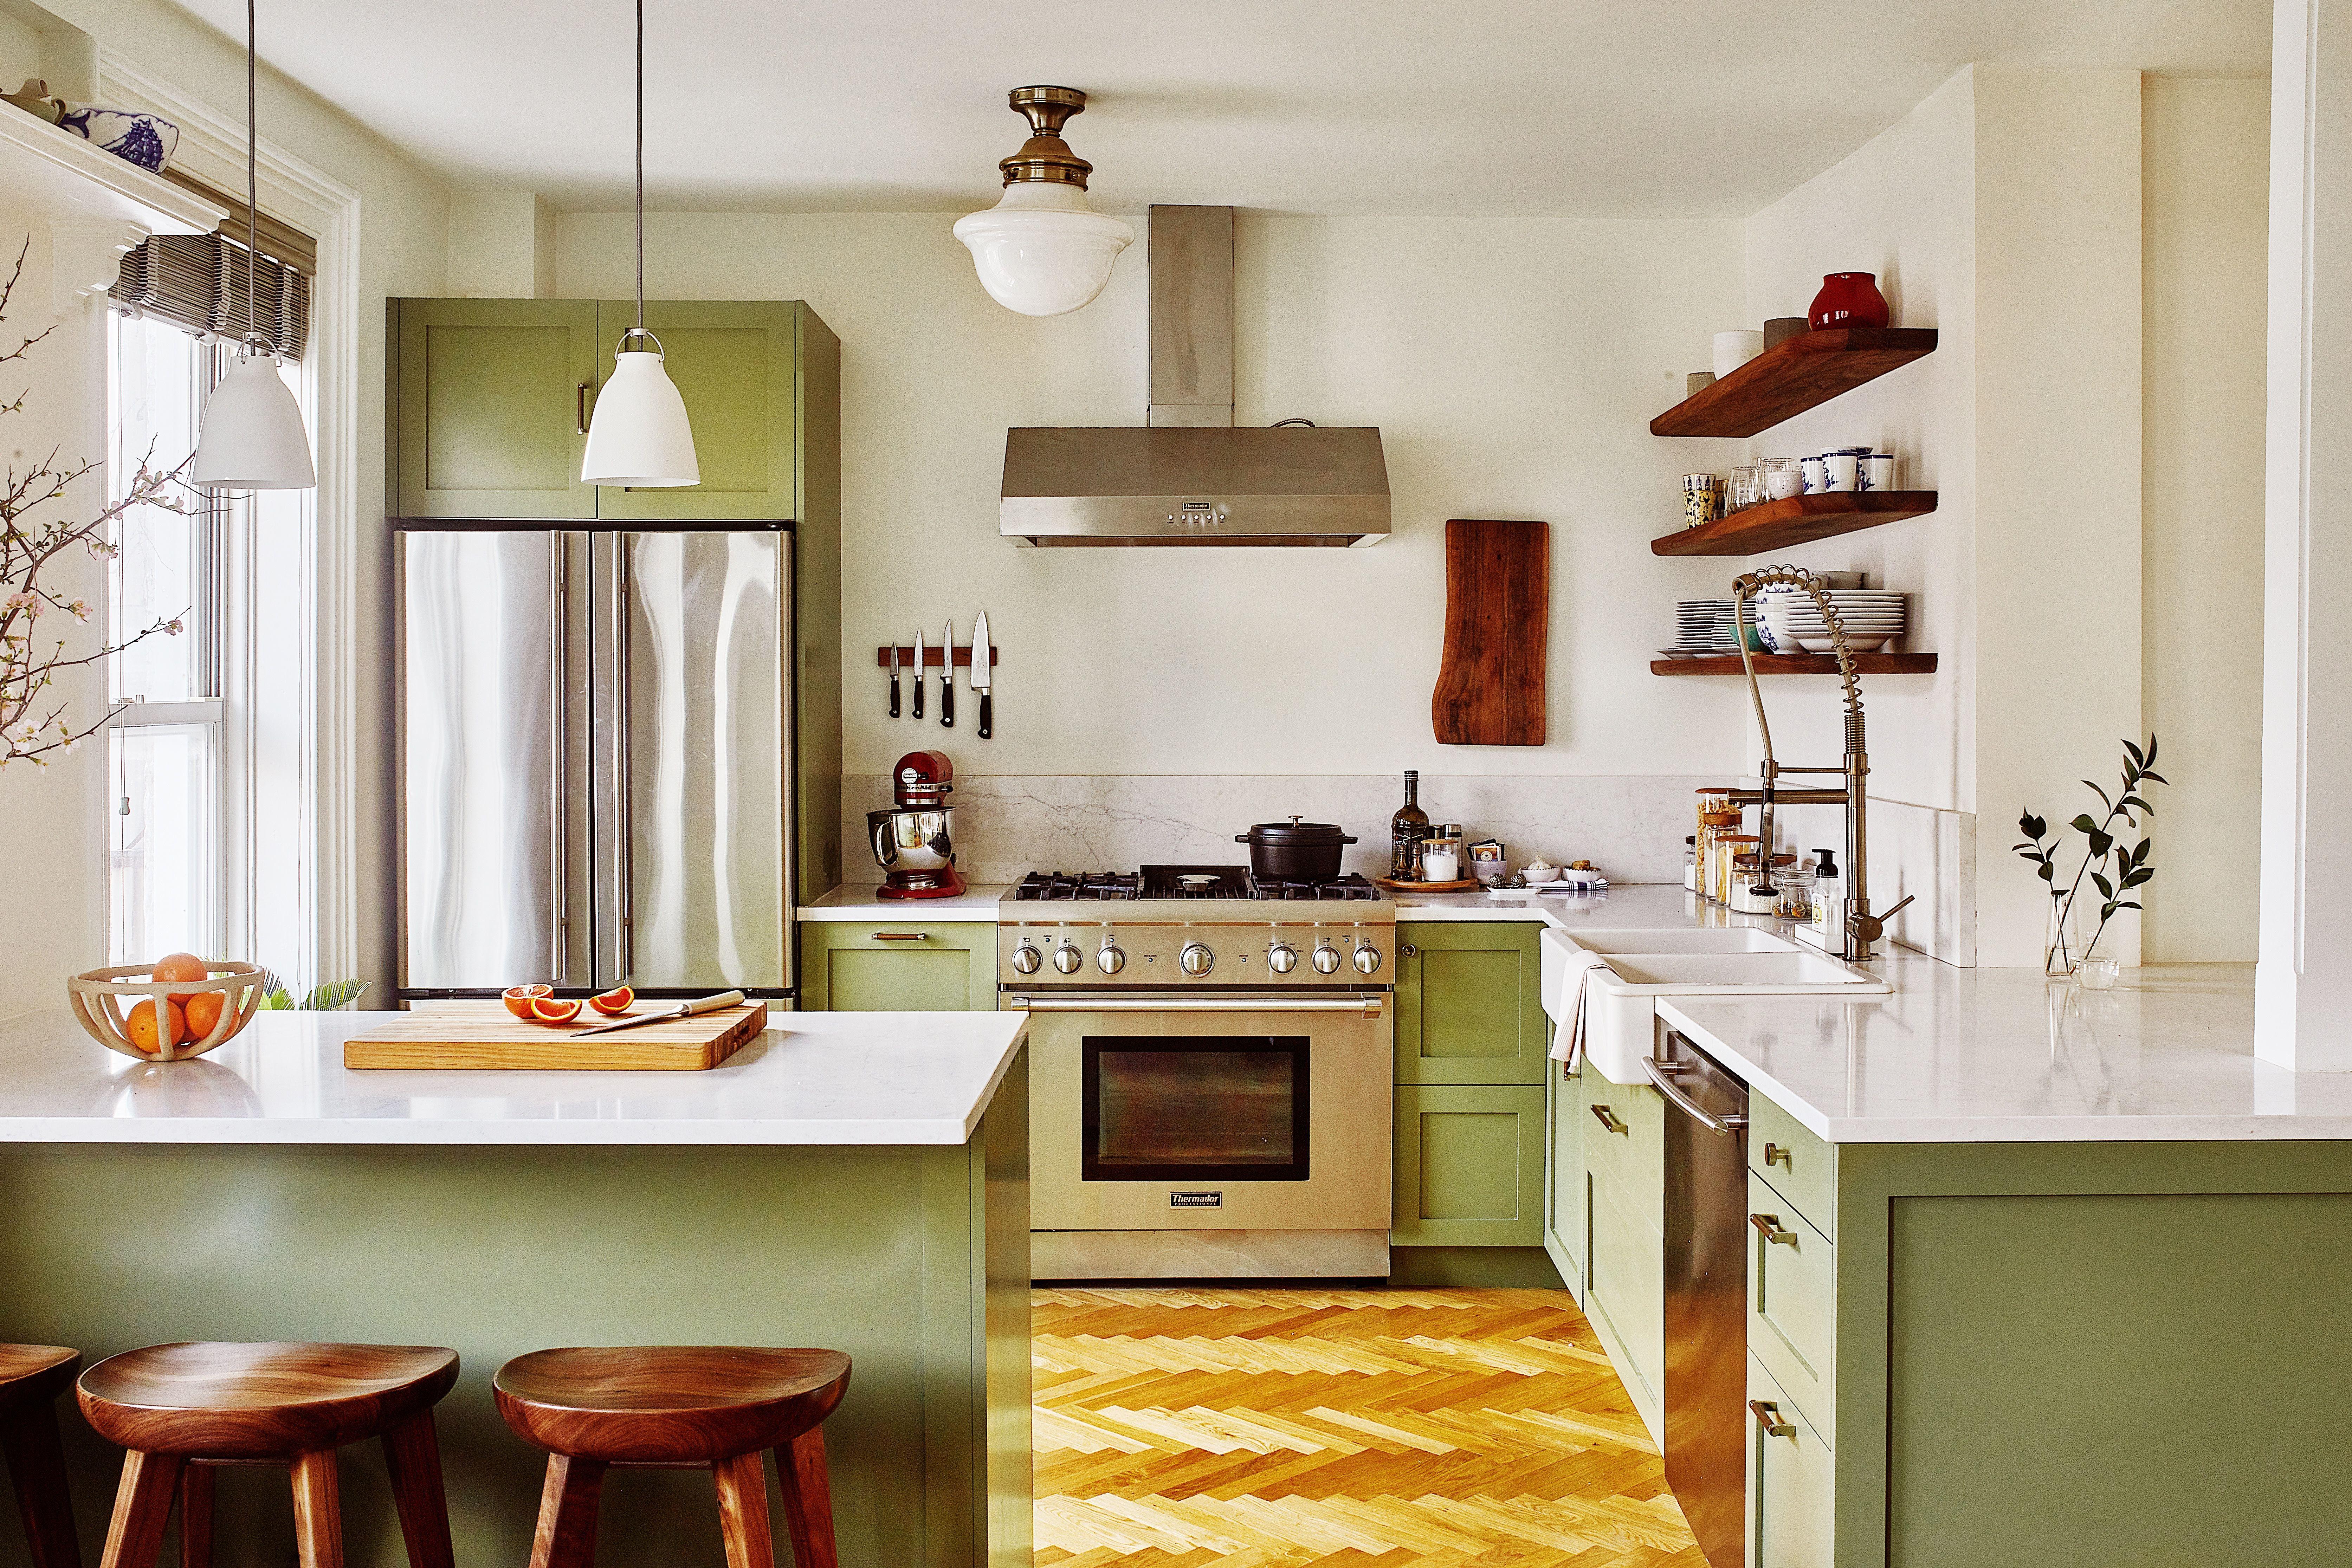 9 Avocado Green Decor Ideas That Pay Homage To The 70s Green Kitchen Cabinets Green Kitchen Kitchen Design